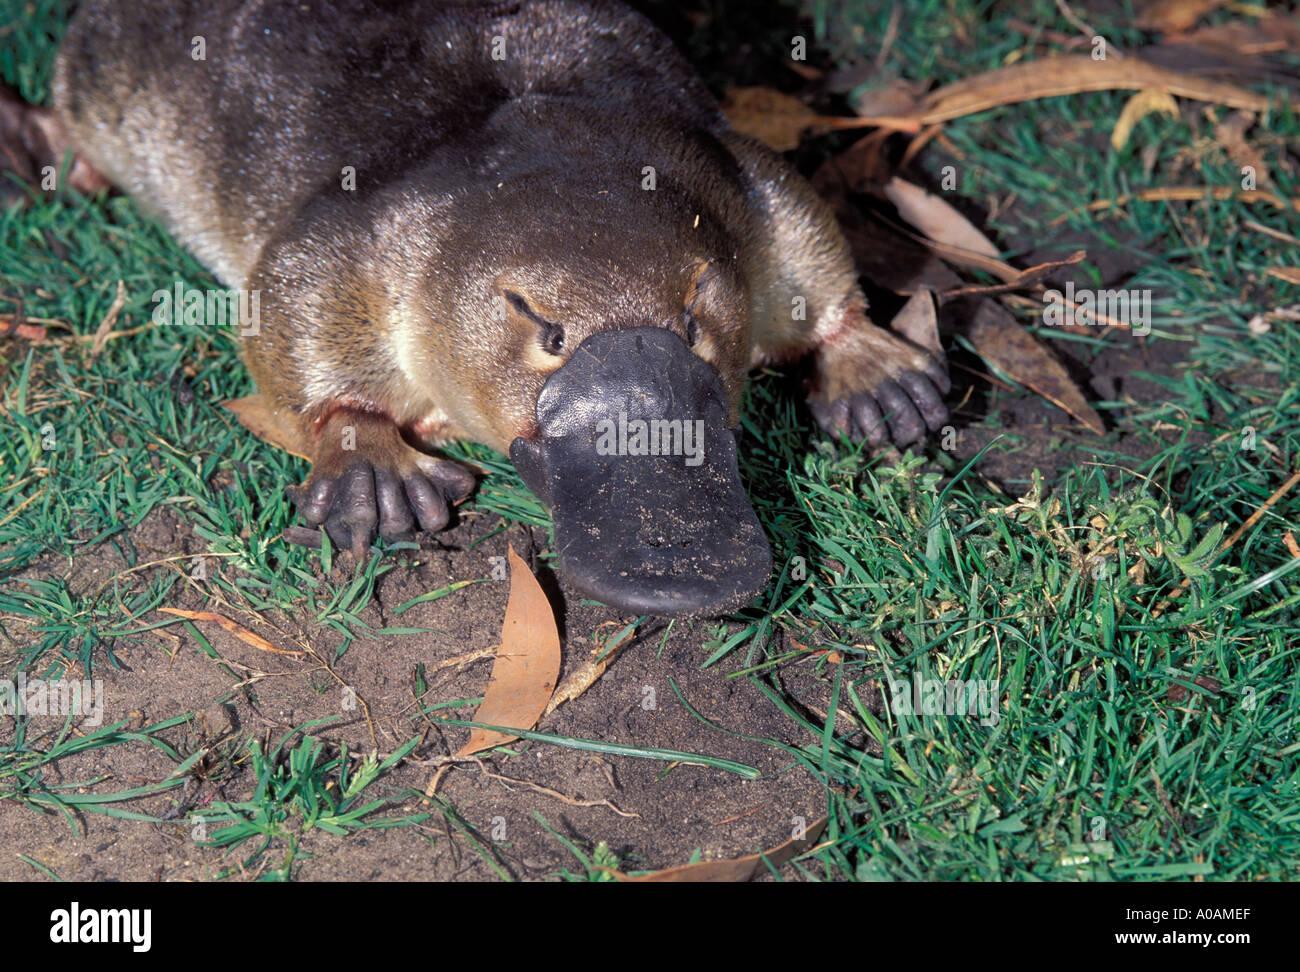 Platypus Ornithorhynchus anatinus Close up of head Stock